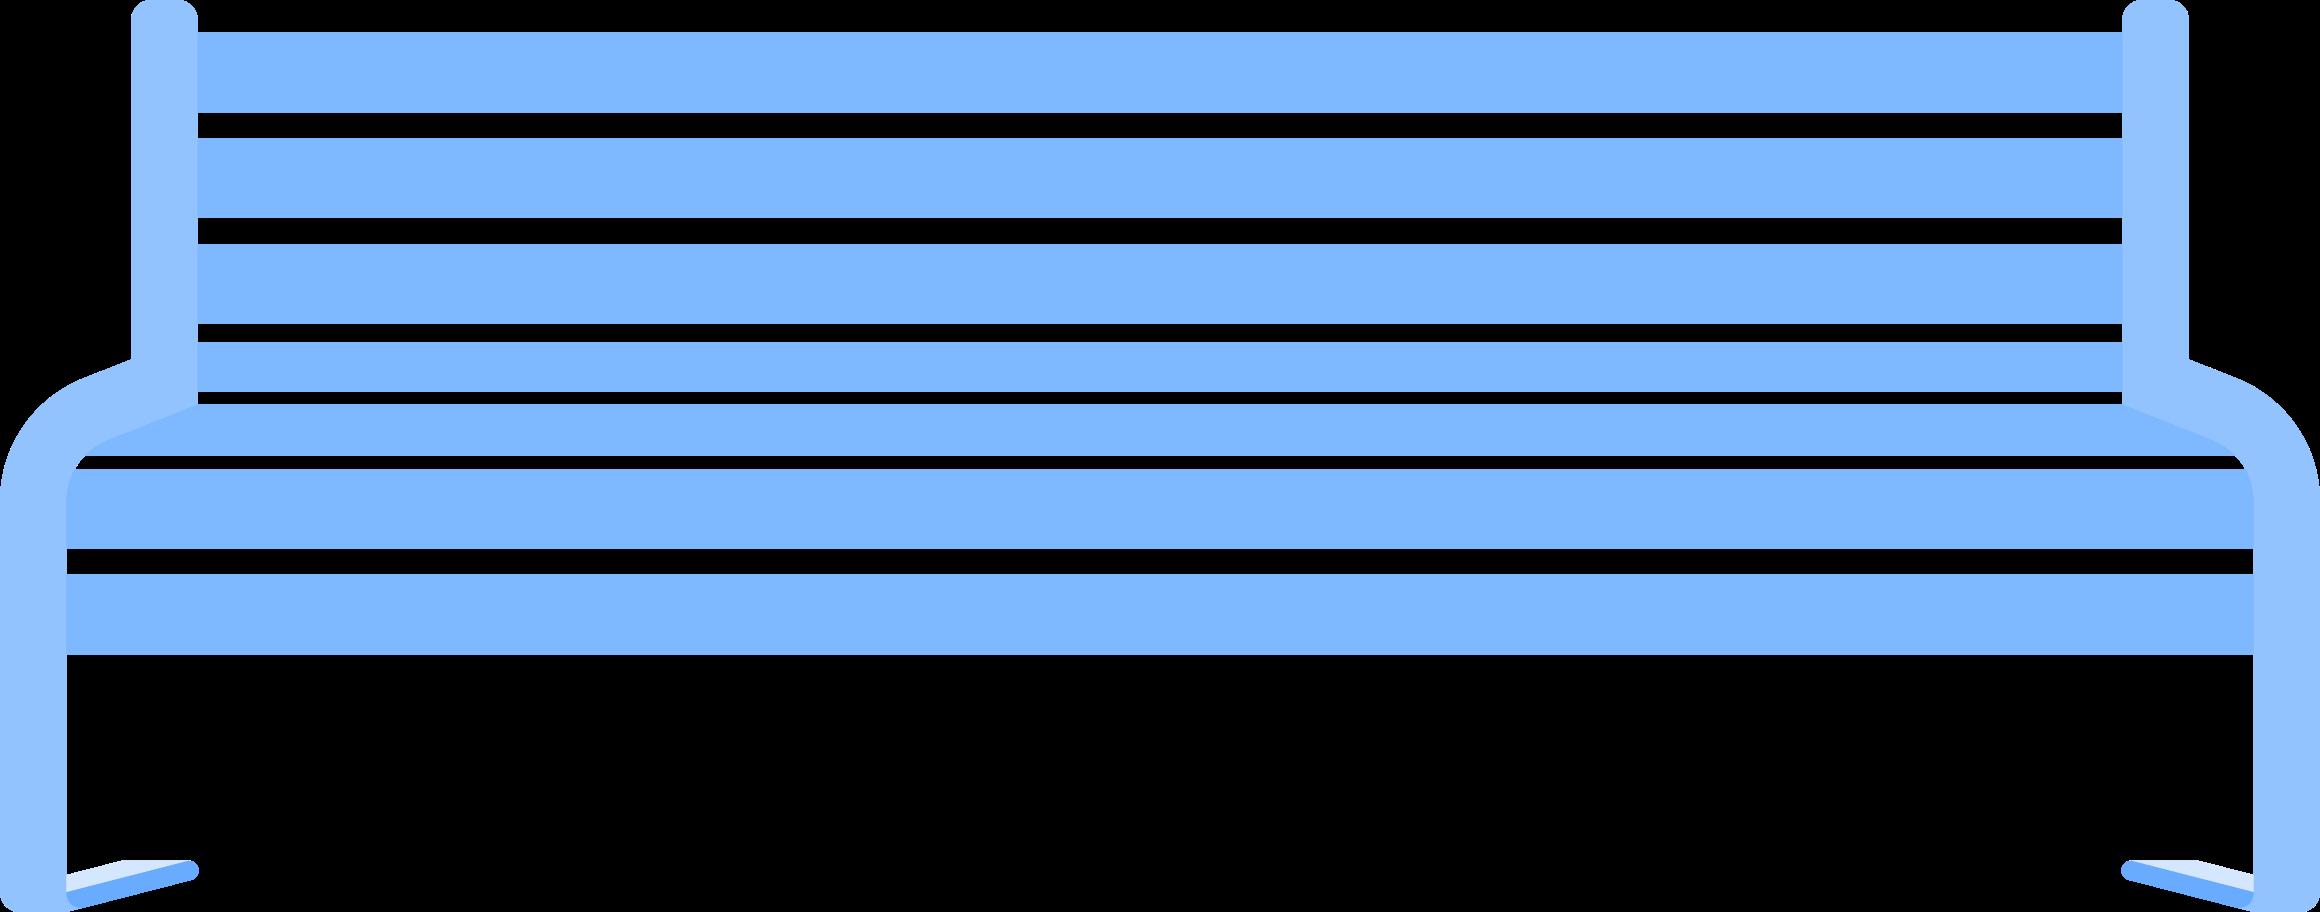 bench Clipart illustration in PNG, SVG